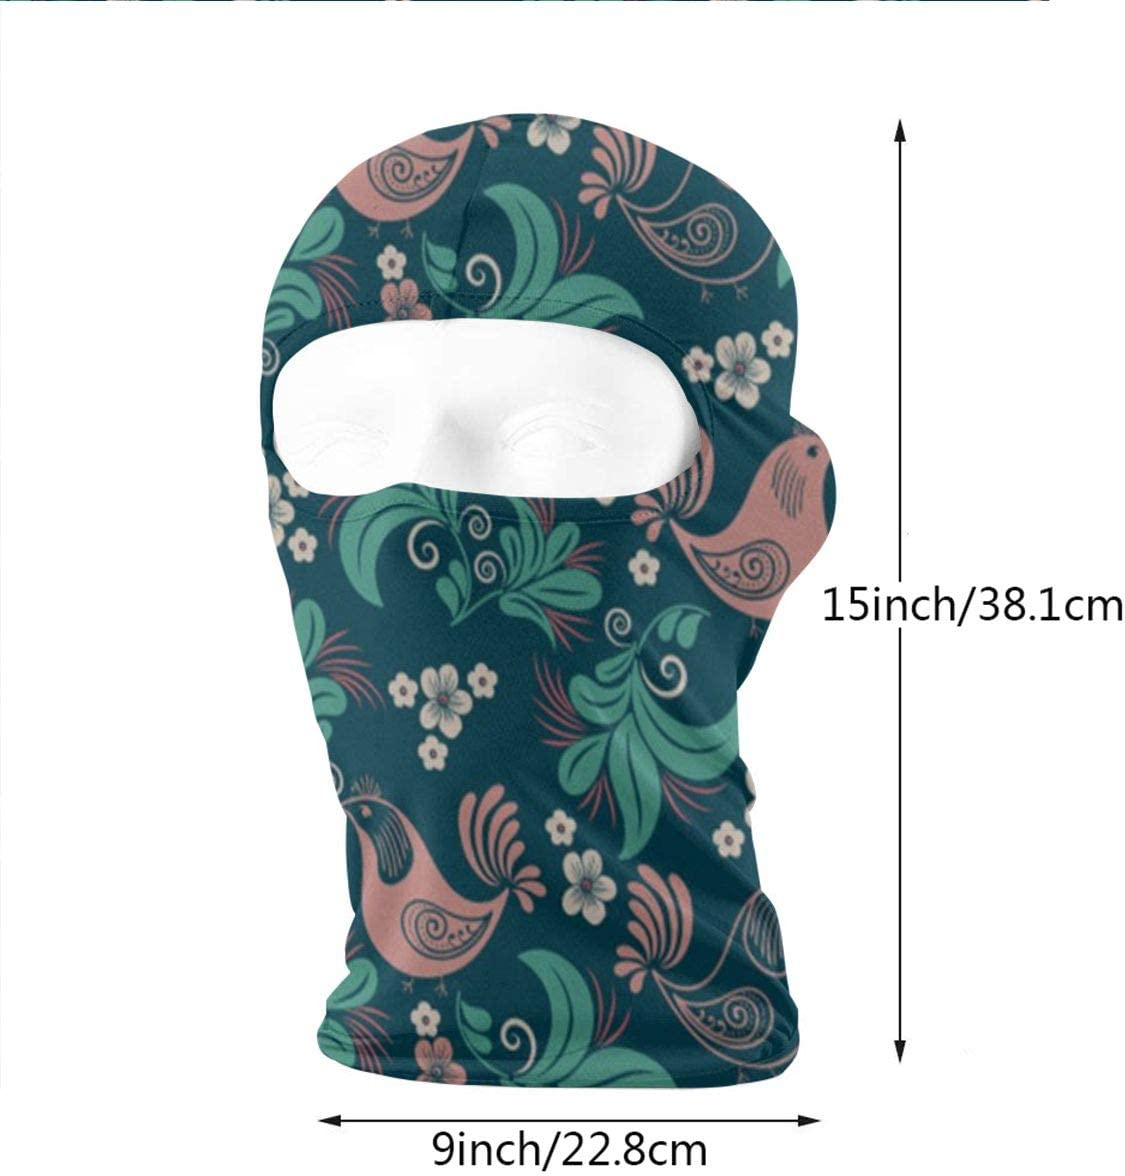 CAClifestyle Plant Flower Bird Seamless Pattern Unisex Windproof Balaclavas Full Face Mask Hood